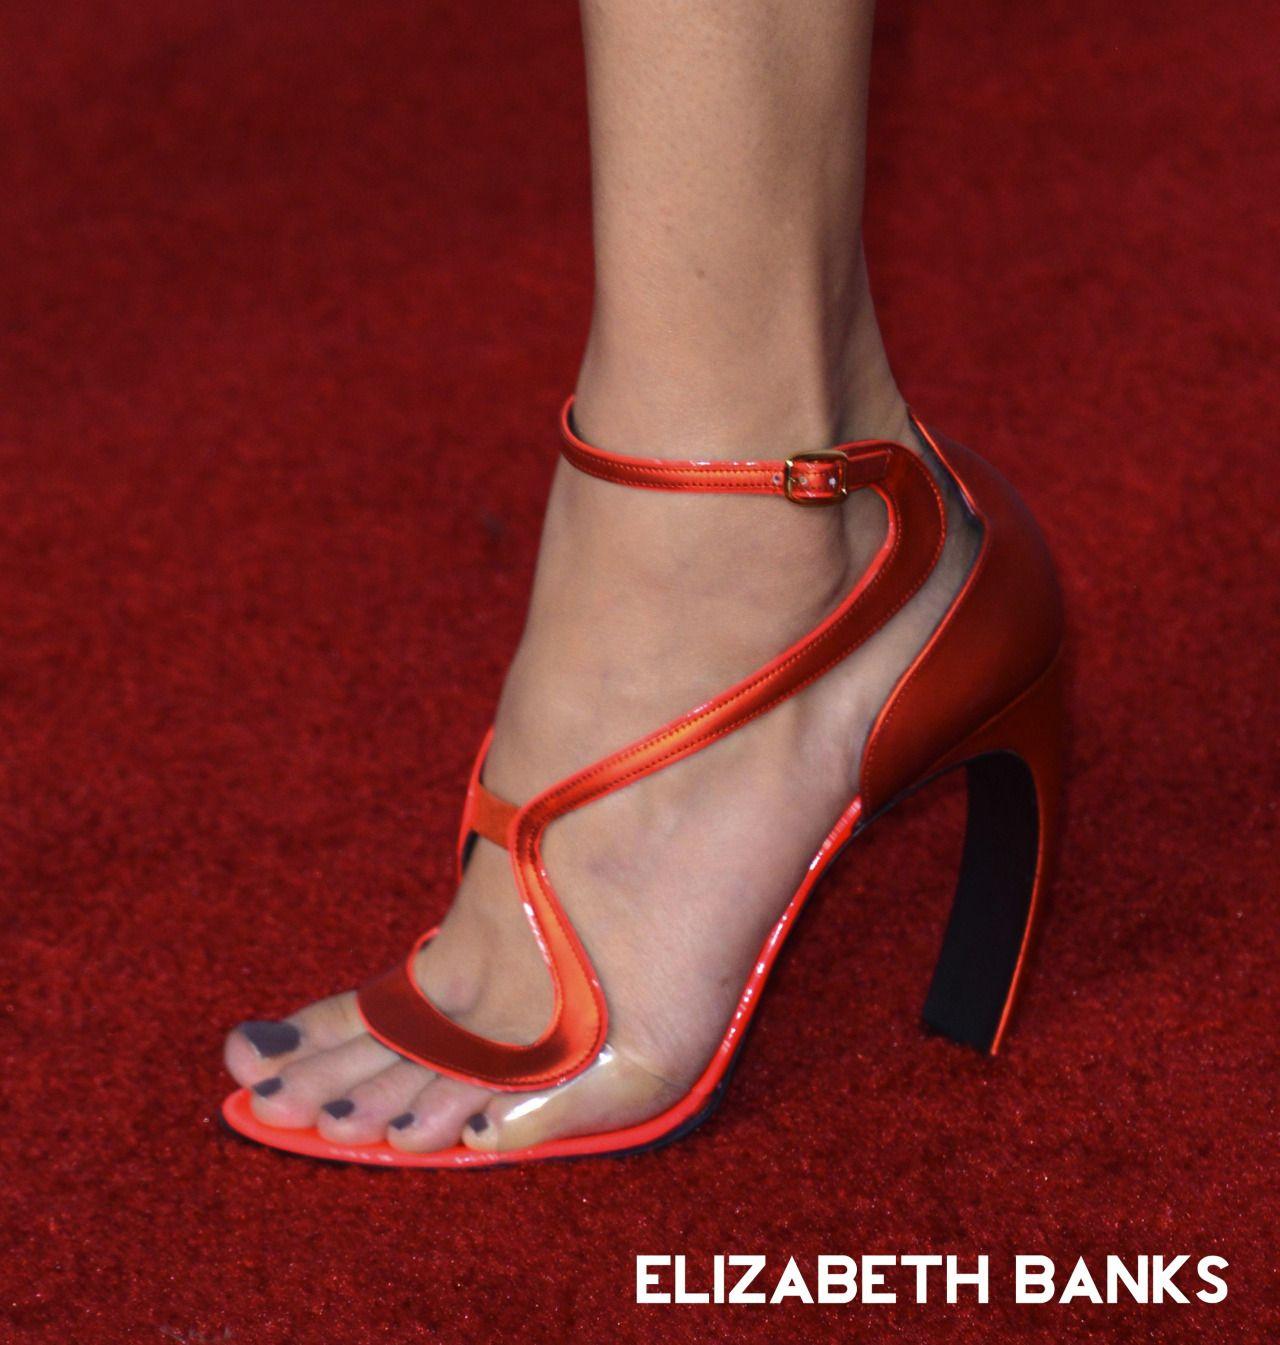 Http Vip Feet Tumblr Com Post 166165883325 Elizabeth Banks Feet Wwwfeettovip Fashion High Heels Heels Perfect Heels